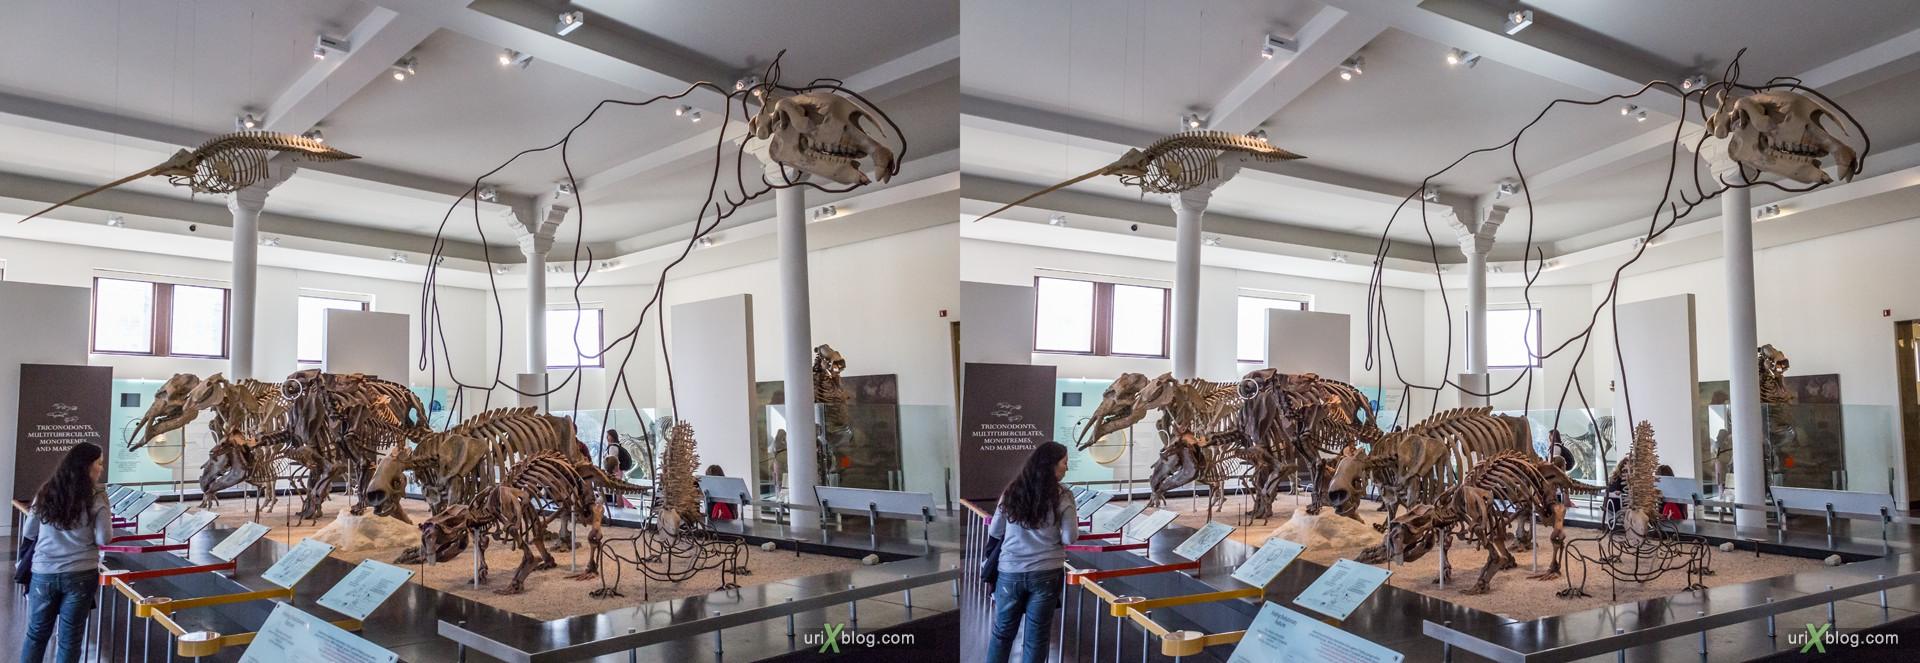 2013, American Museum of Natural History, NYC, New York City, USA, animal, dinosaur, skeleton, 3D, stereo pair, cross-eyed, crossview, cross view stereo pair, stereoscopic